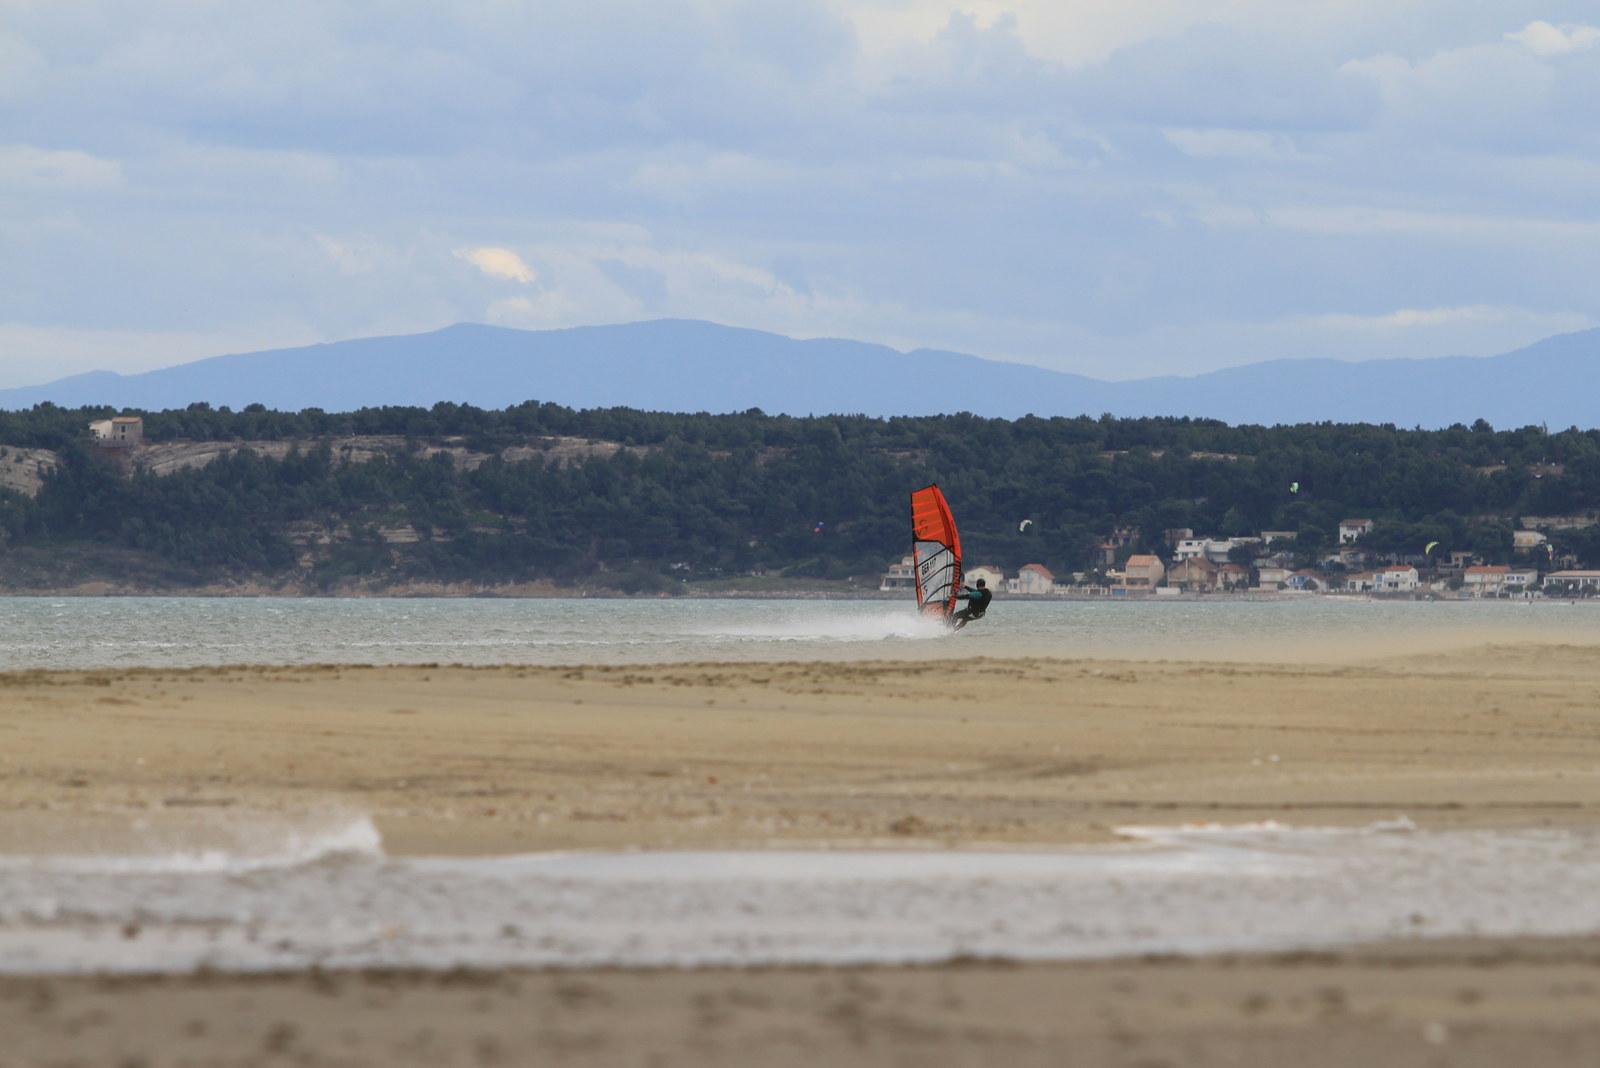 Windsurfen_LaFranqui_761_406.JPG